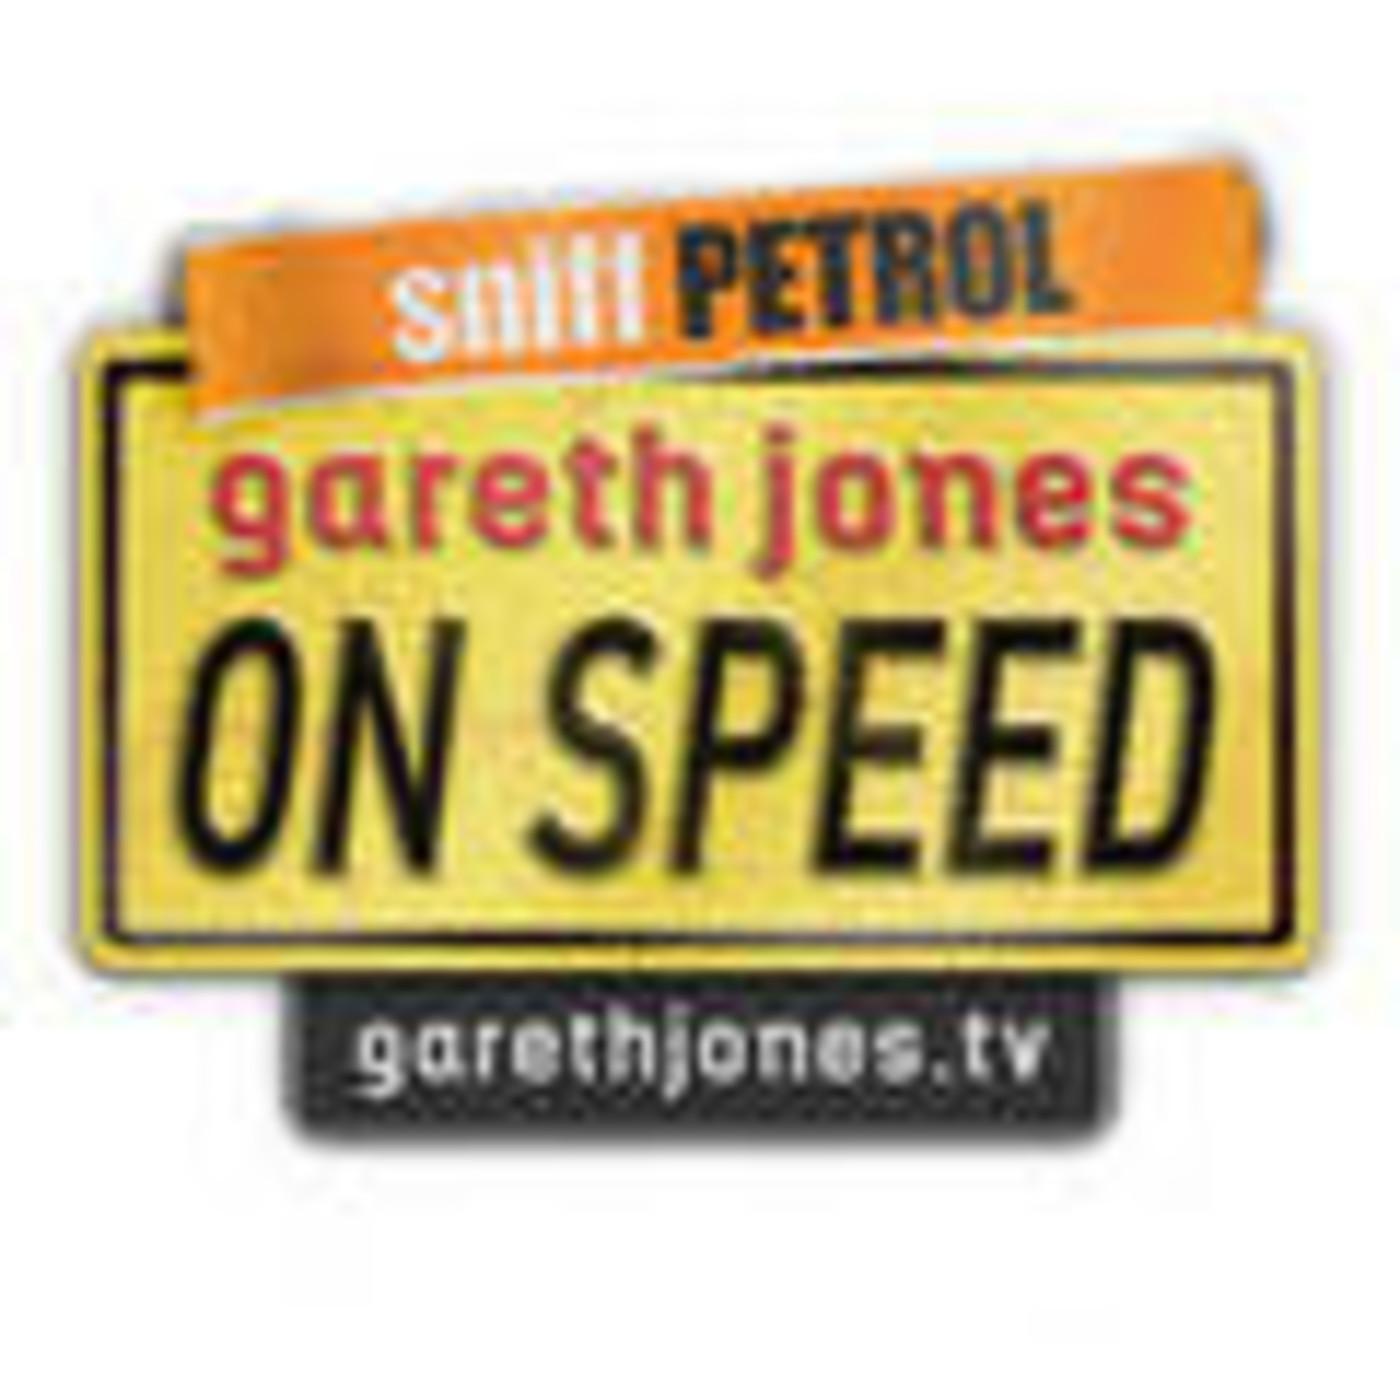 www.garethjones.tv